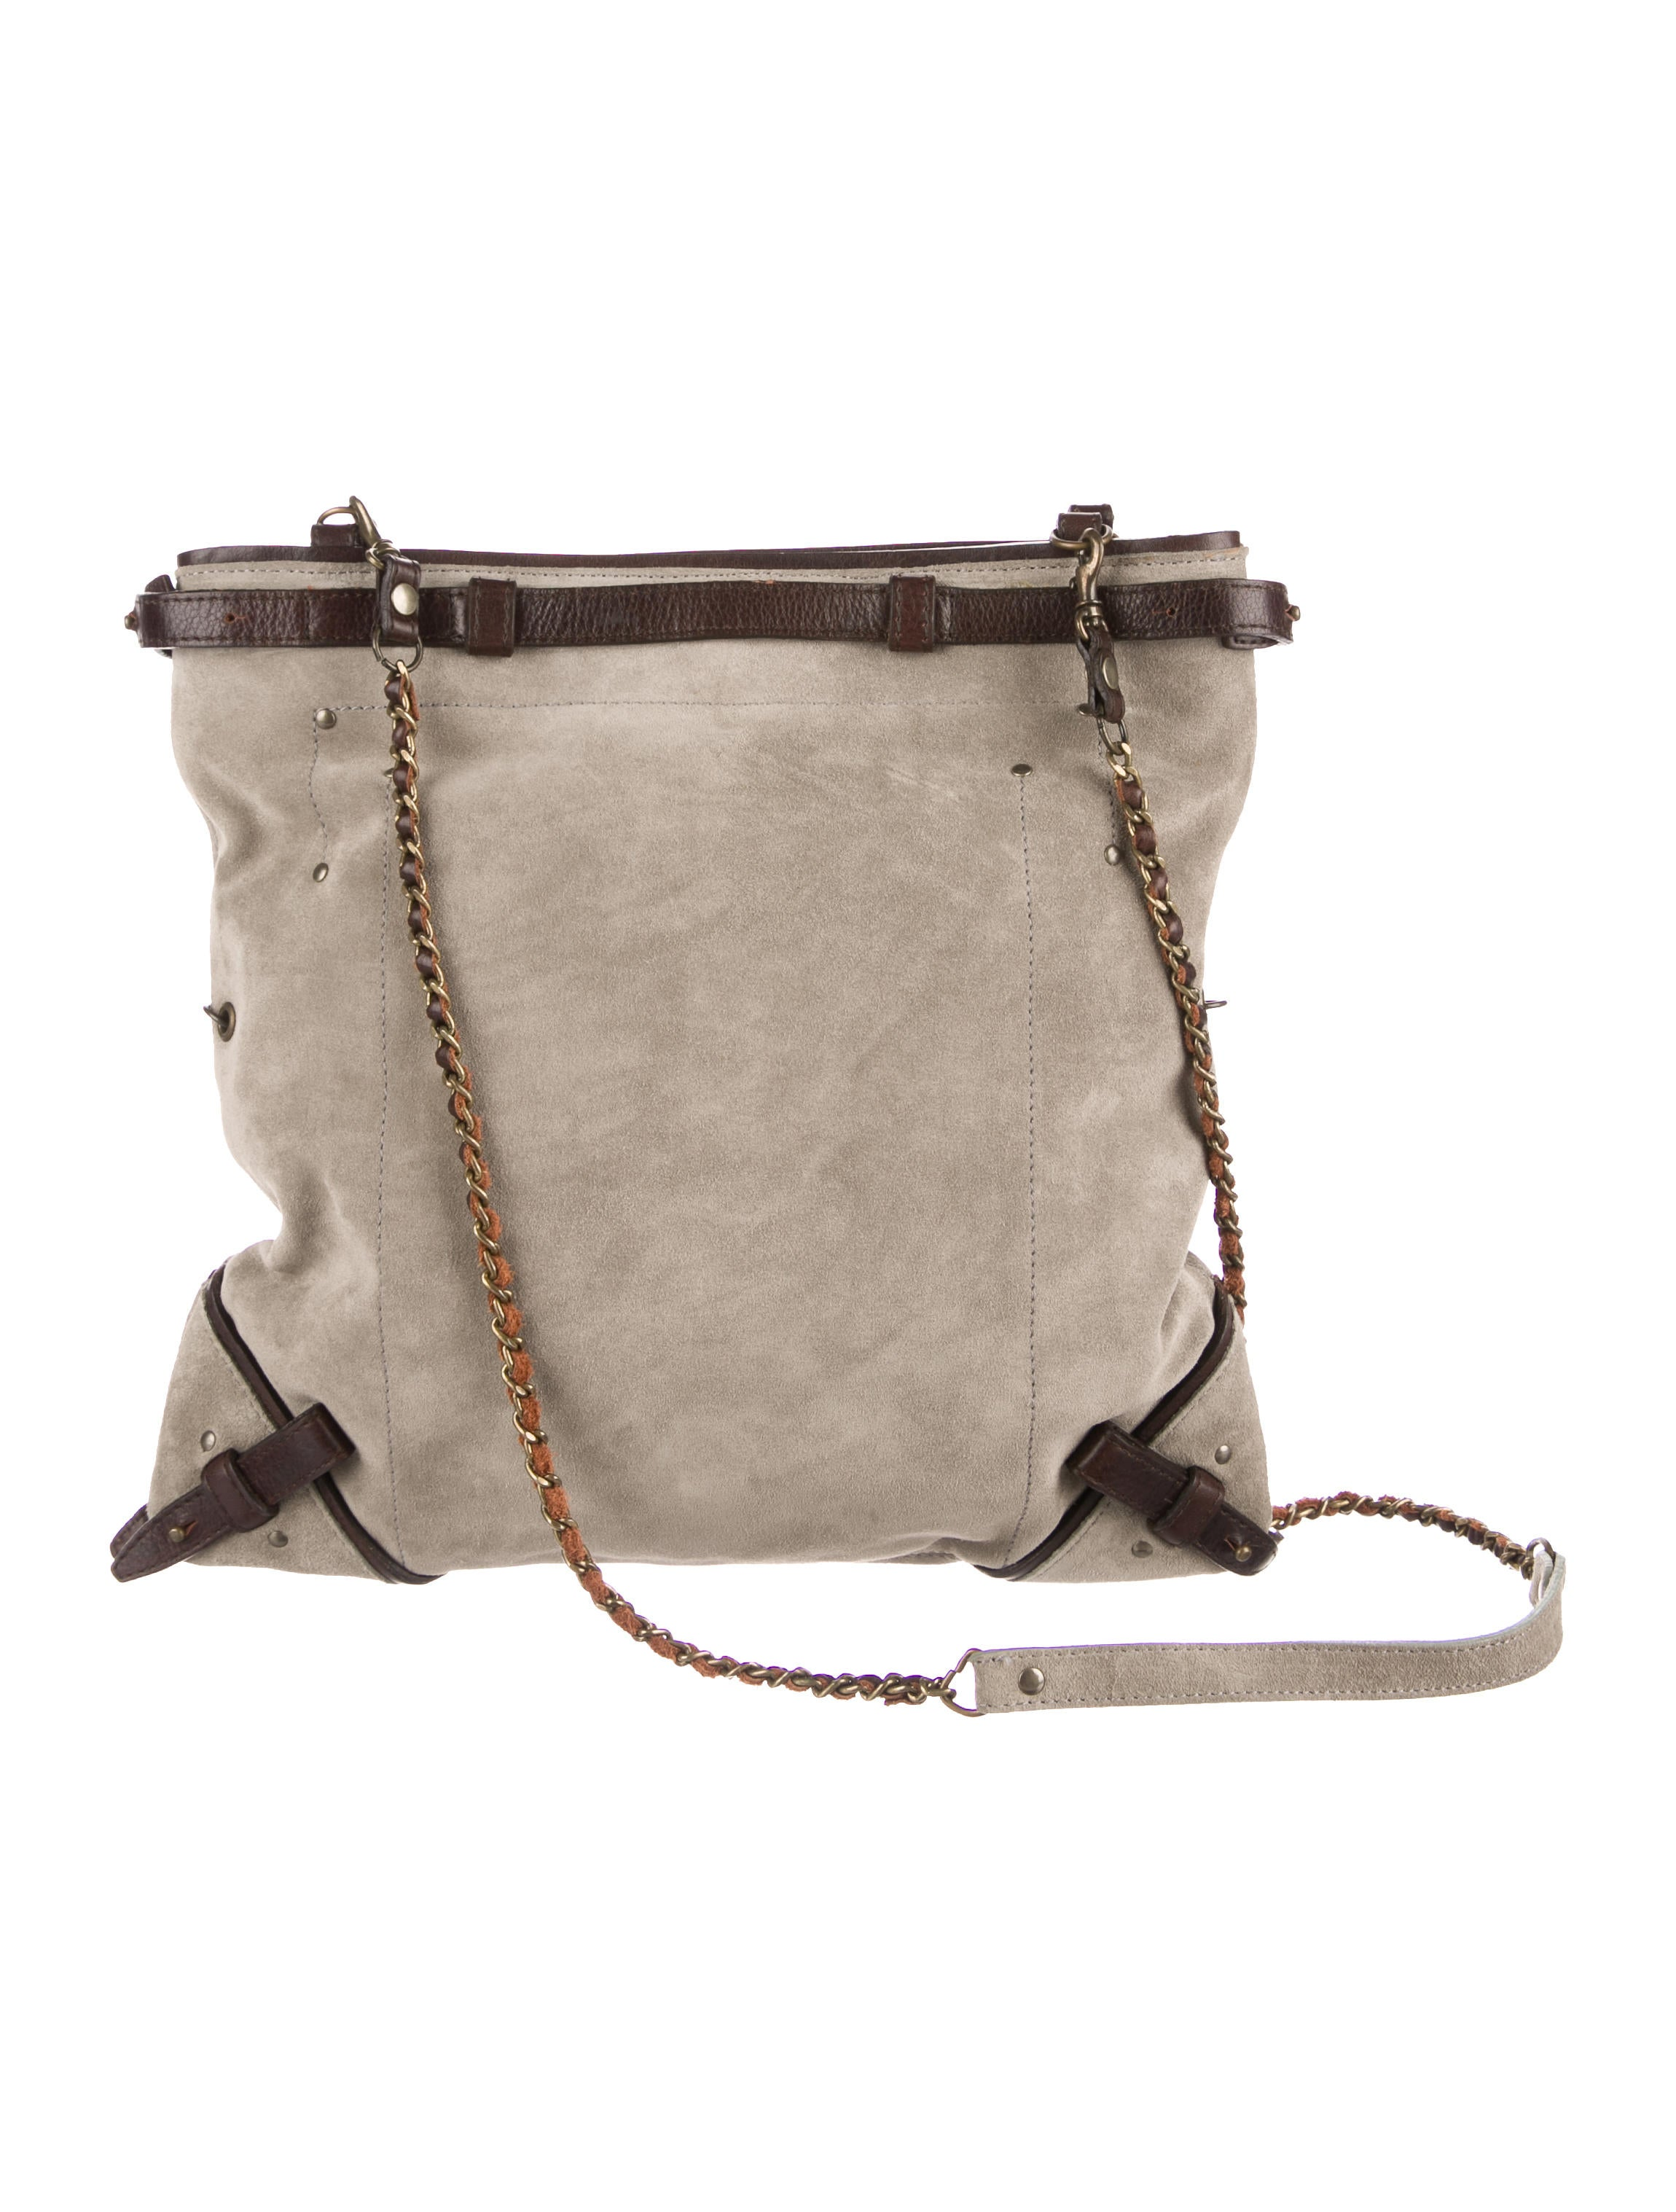 Jerome Dreyfuss Suede Crossbody Bag Handbags Jrd21182